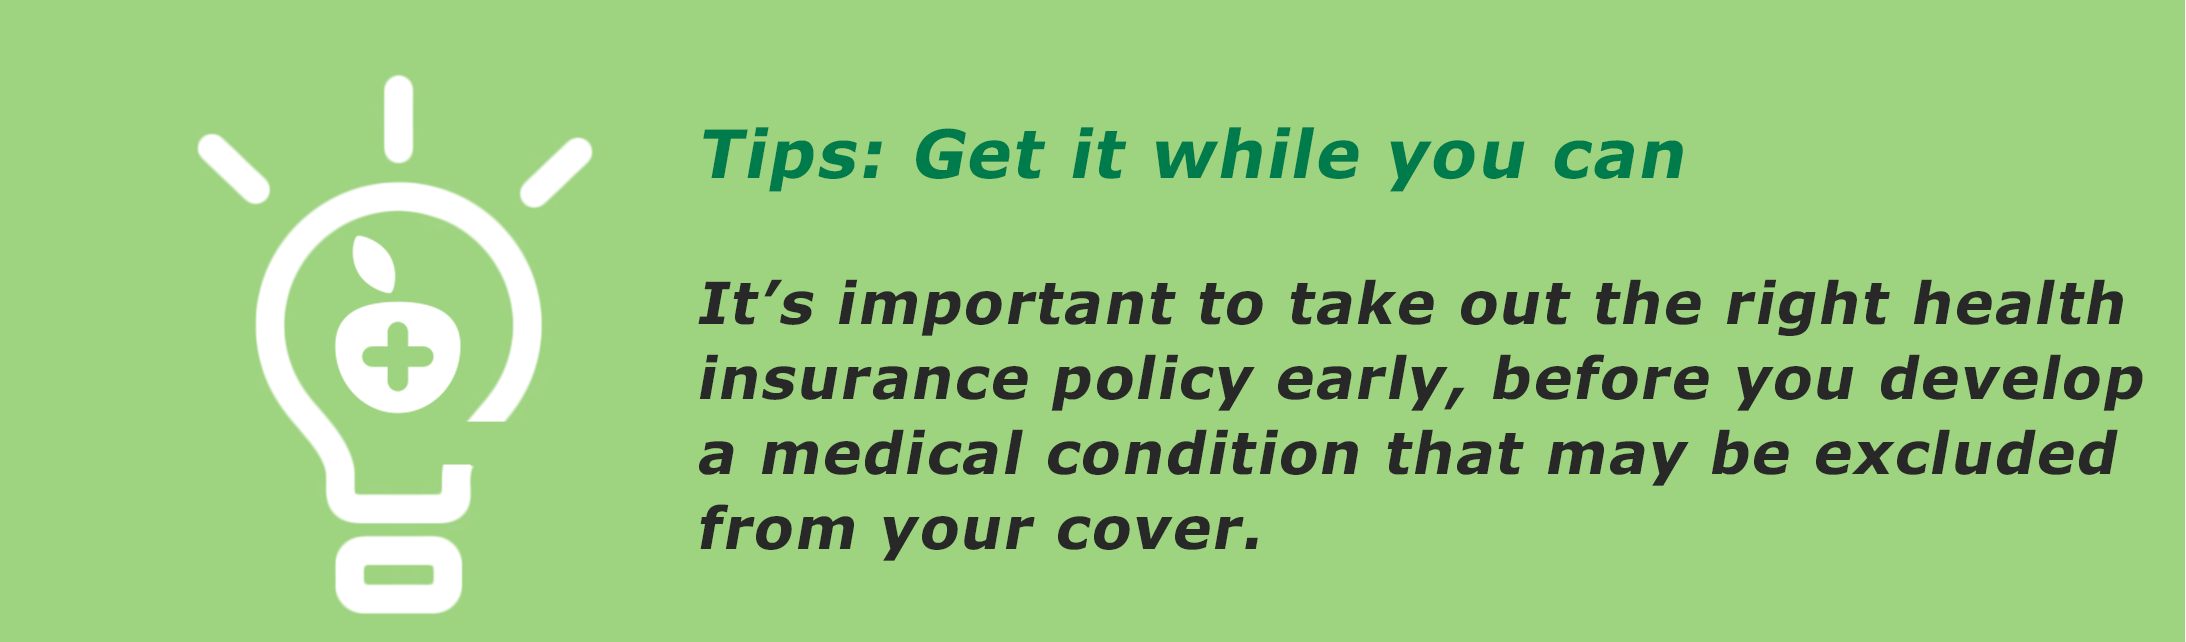 health insurance guide-tip1